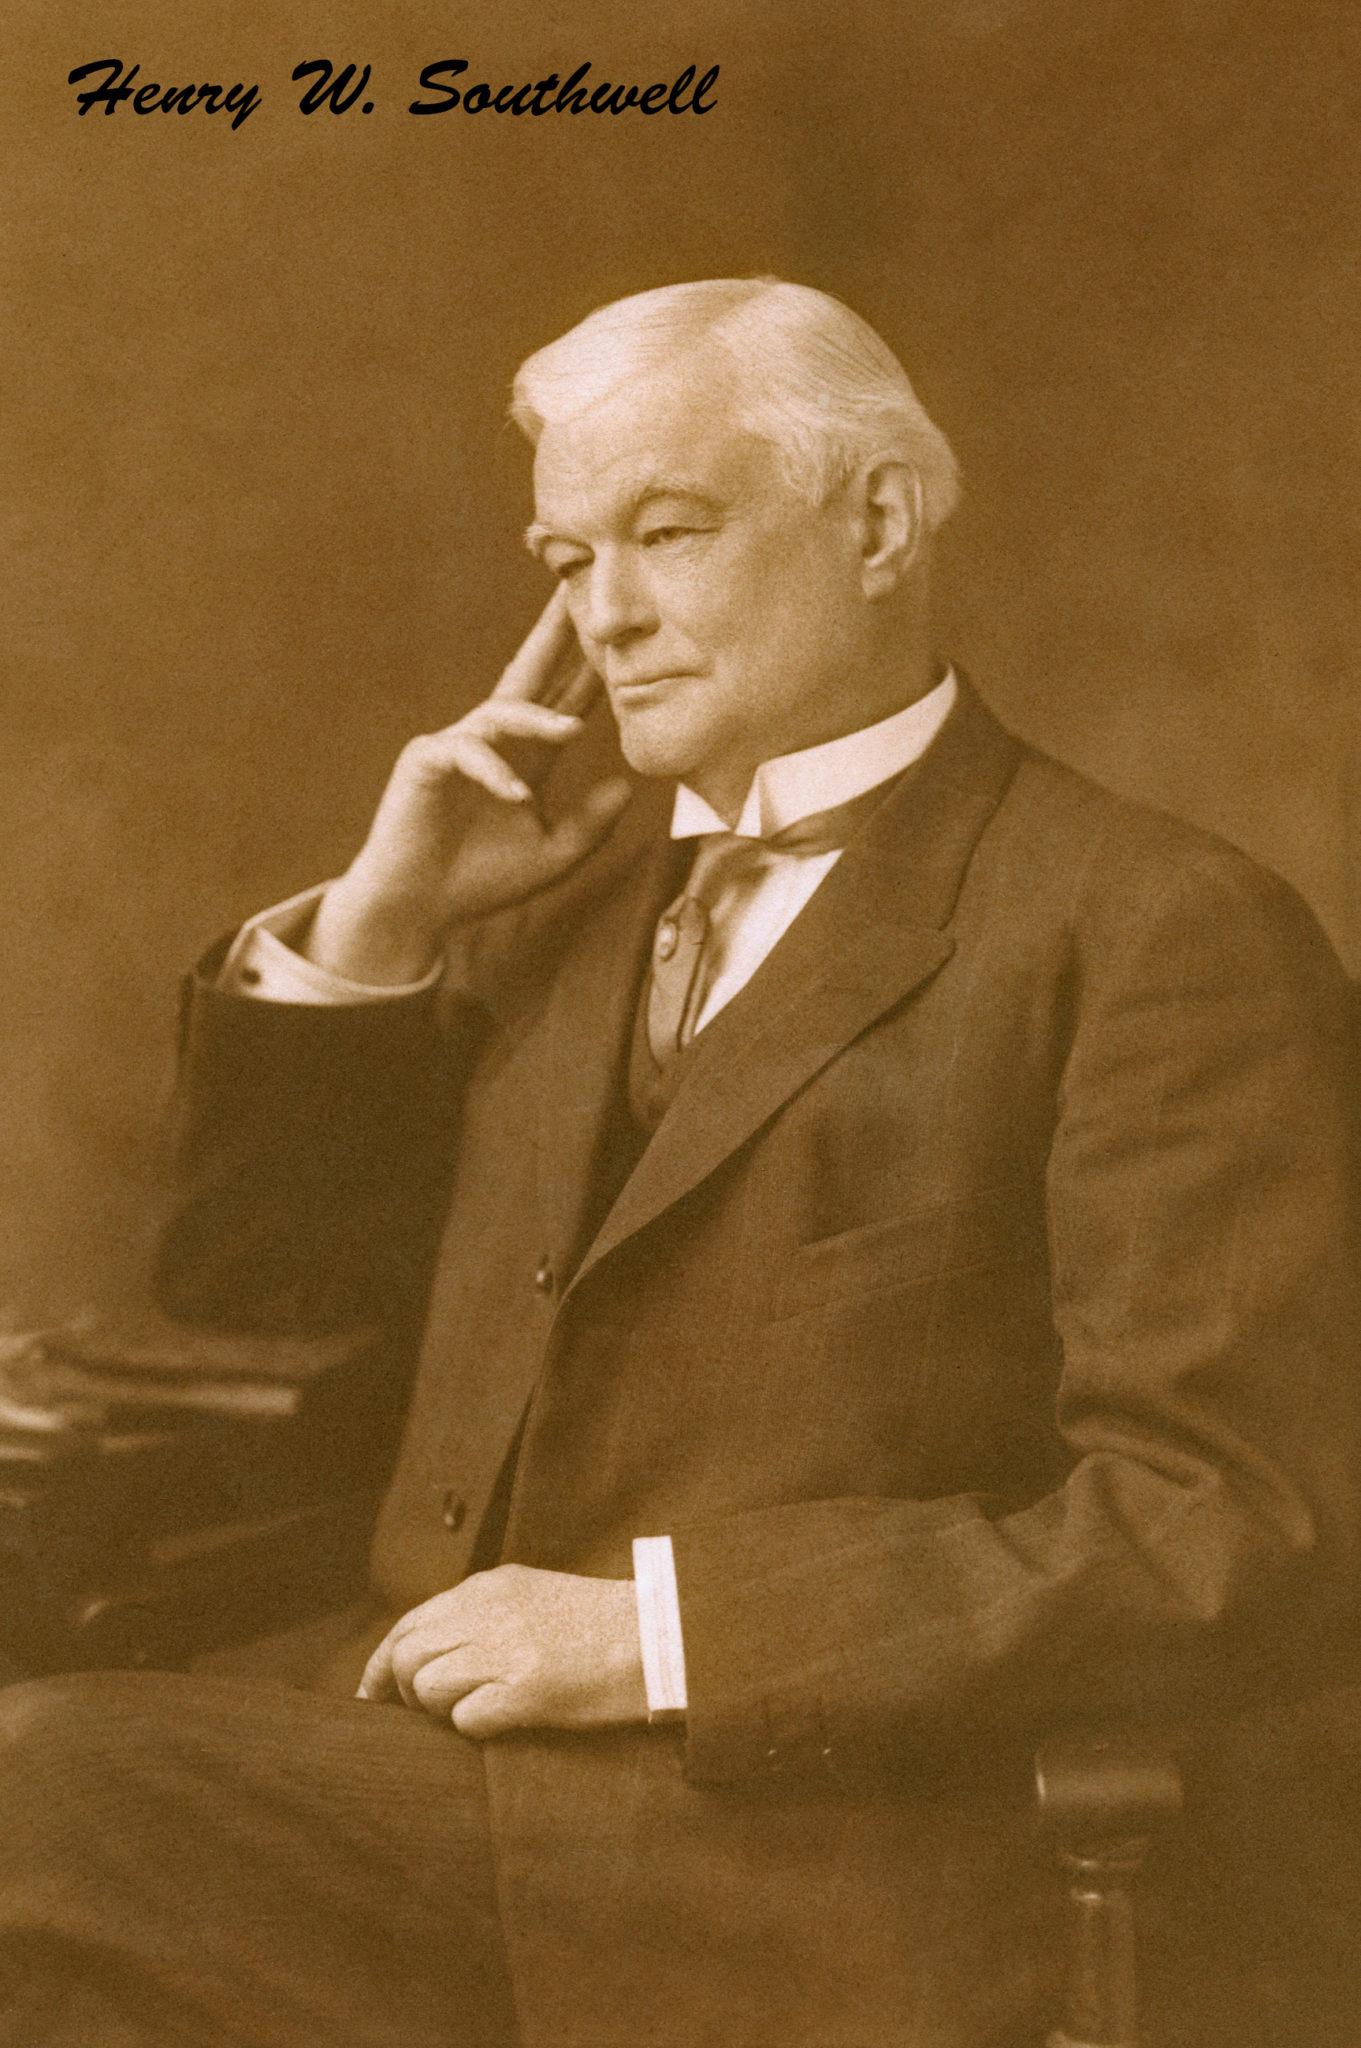 Henry W. Southwell